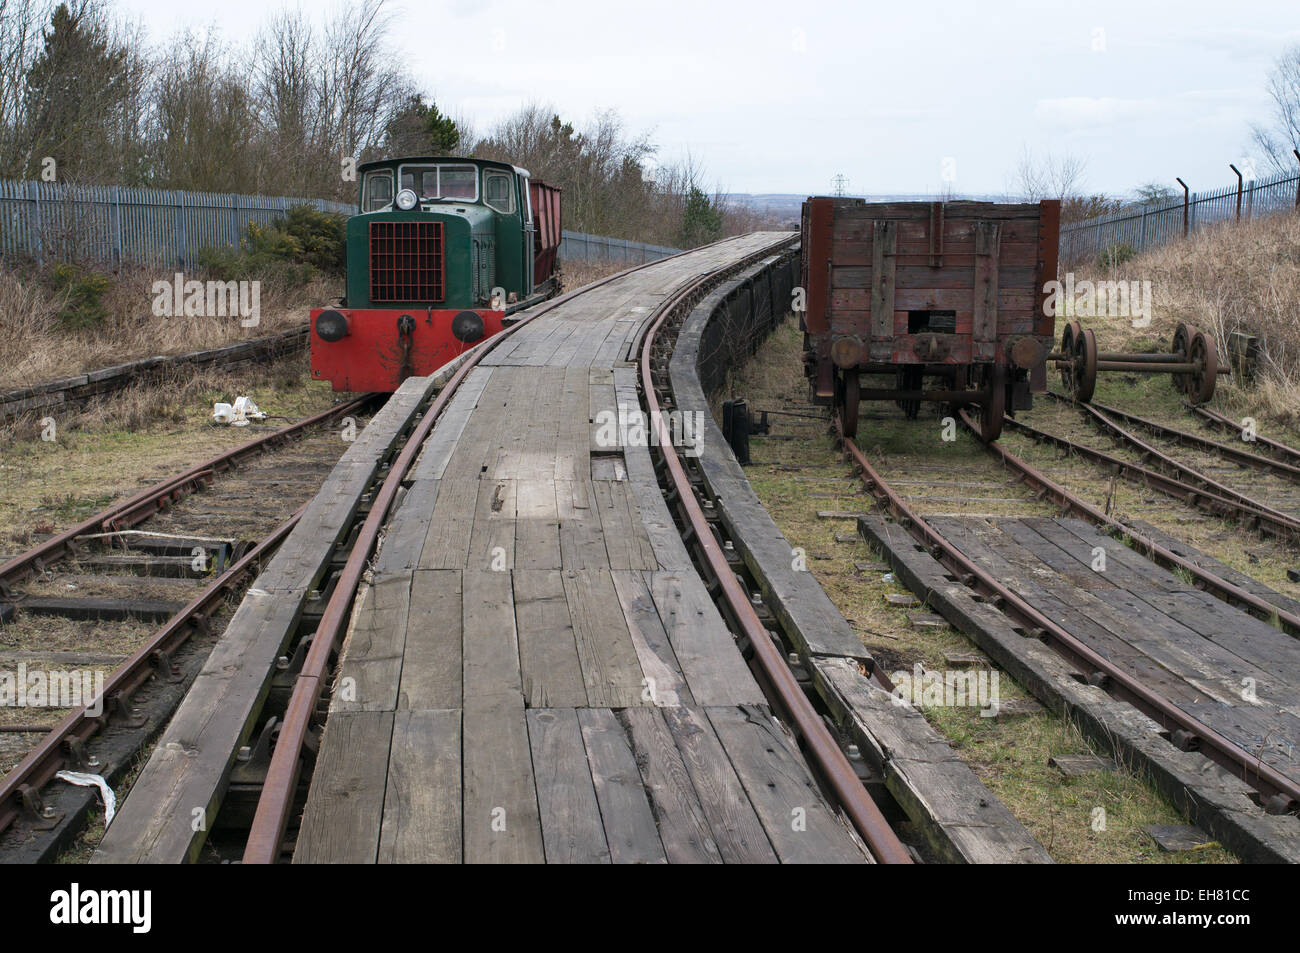 Annäherung an der Spitze der Steigung selbst handeln von der Bowes geschleppt Seil Bahn Springwell, Nord-Ost Stockbild